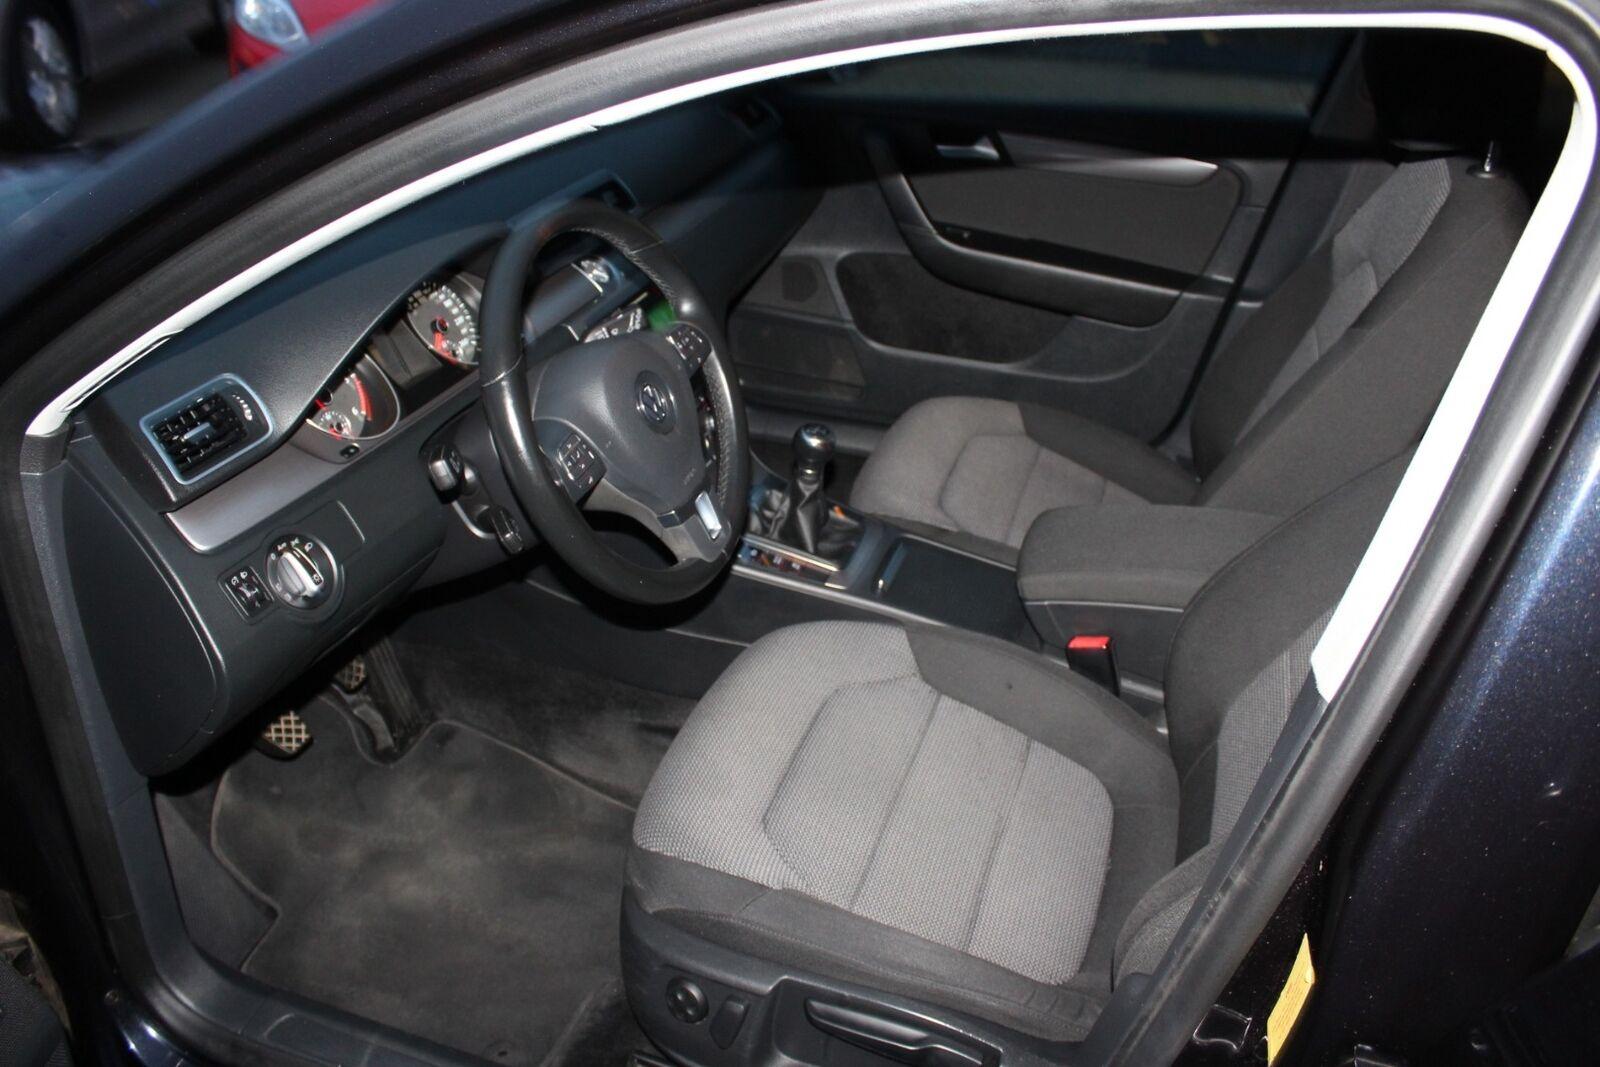 VW Passat 2,0 TDi 140 Comfortl. Vari. BMT - billede 8